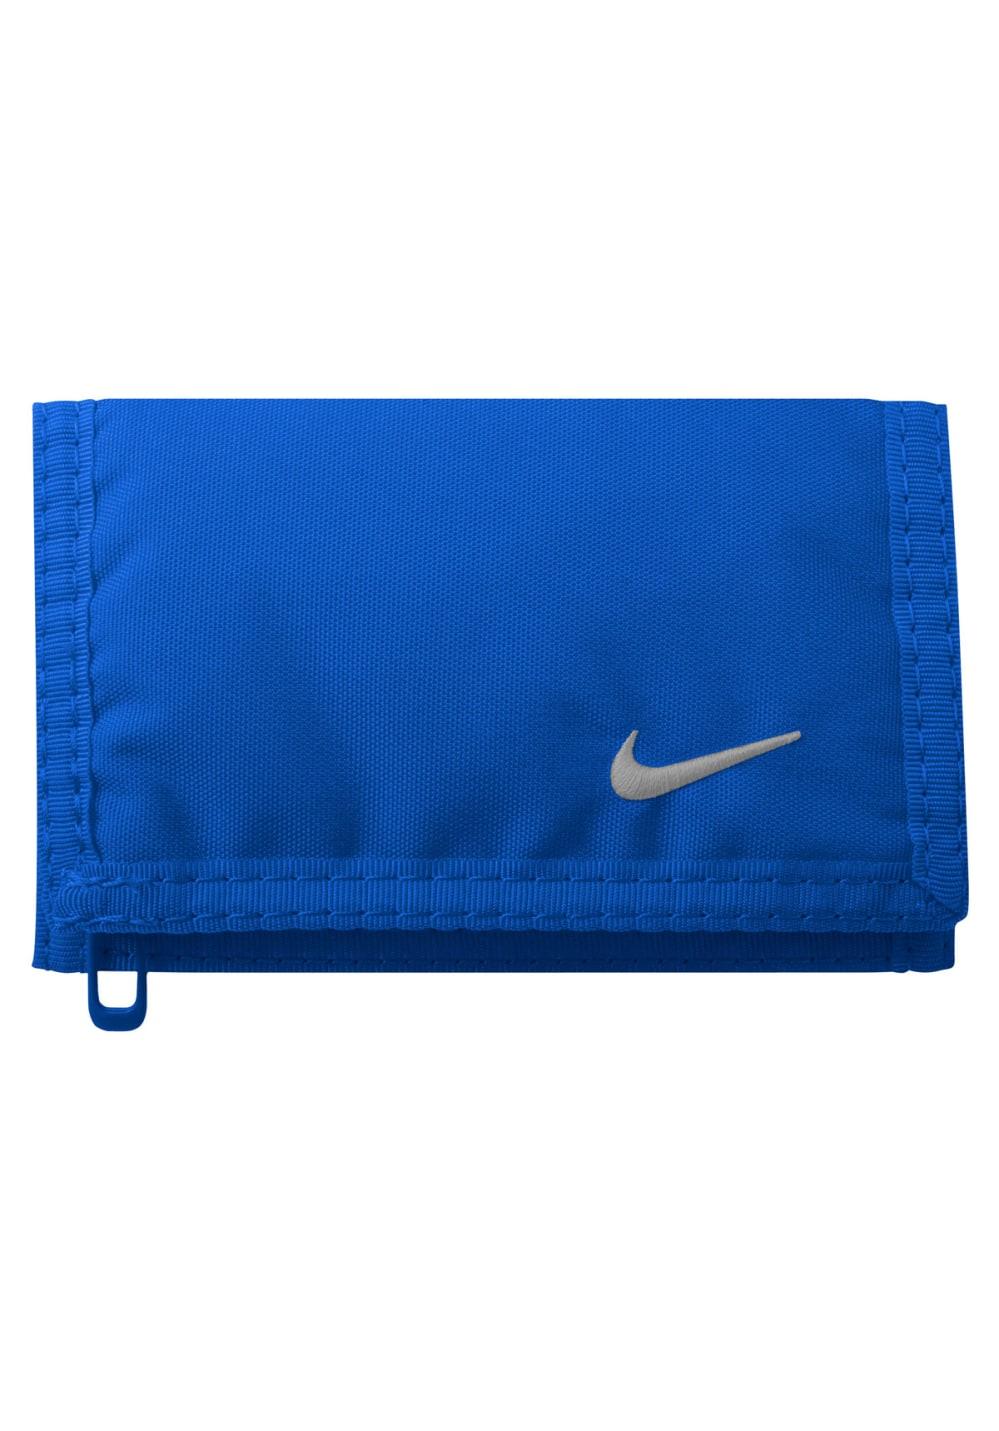 Nike Basic Wallet Sporttaschen - Blau